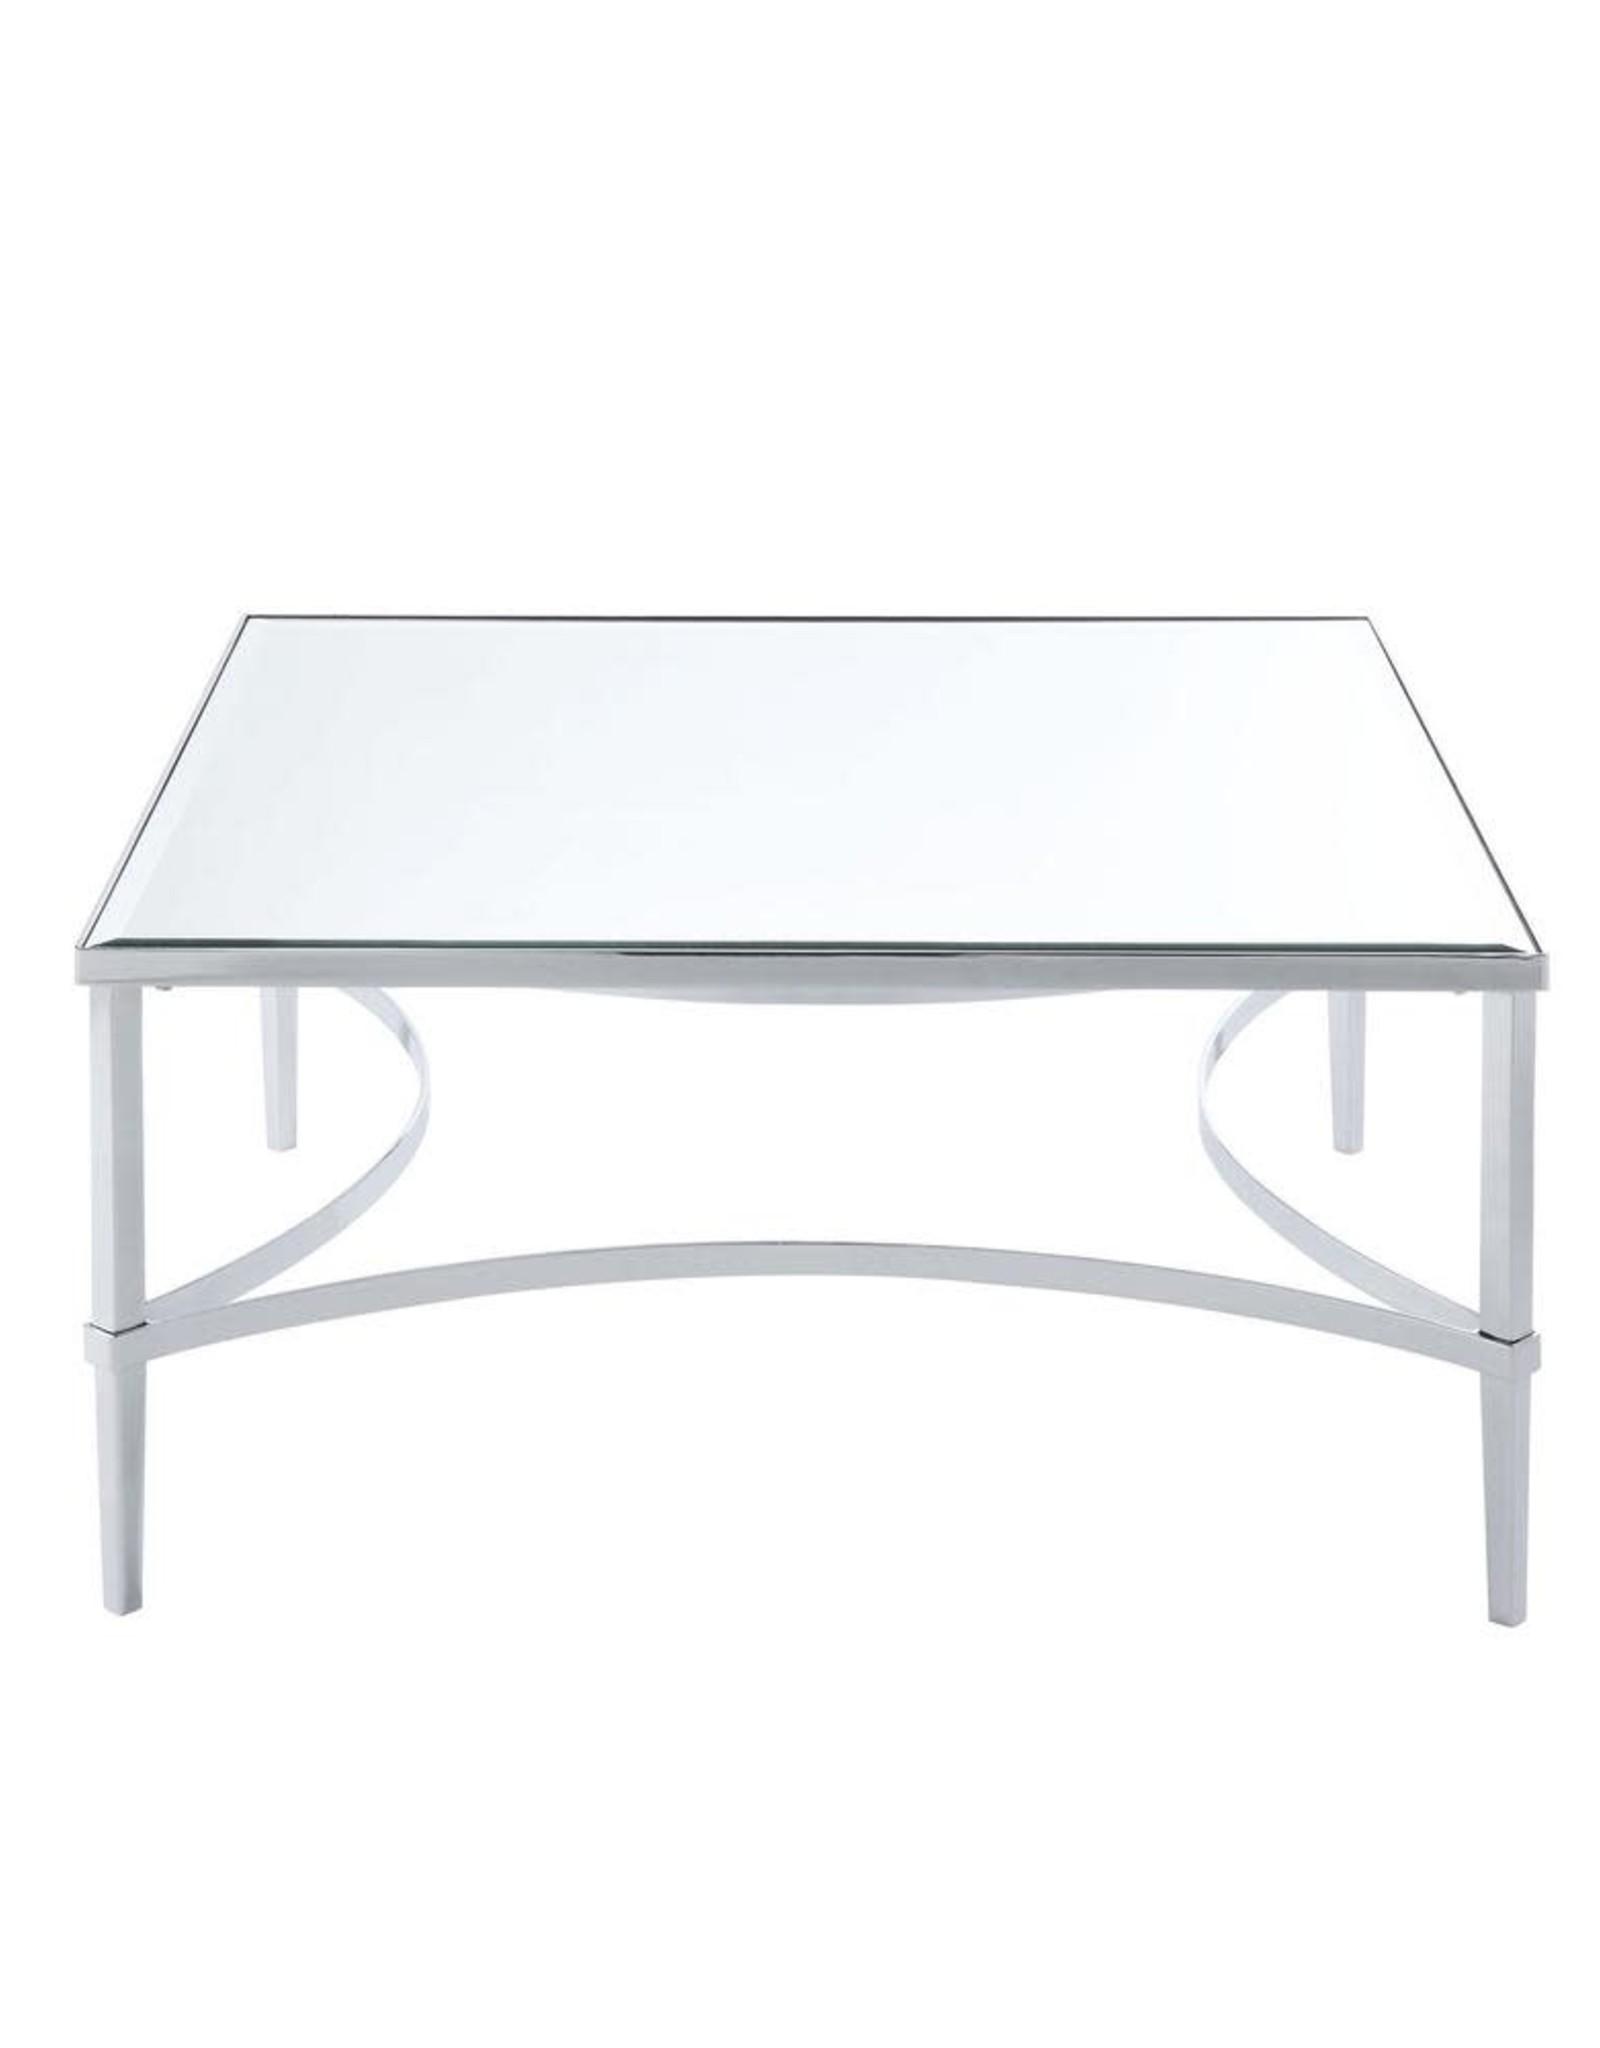 Petunia Chrome and Mirrored Coffee Table